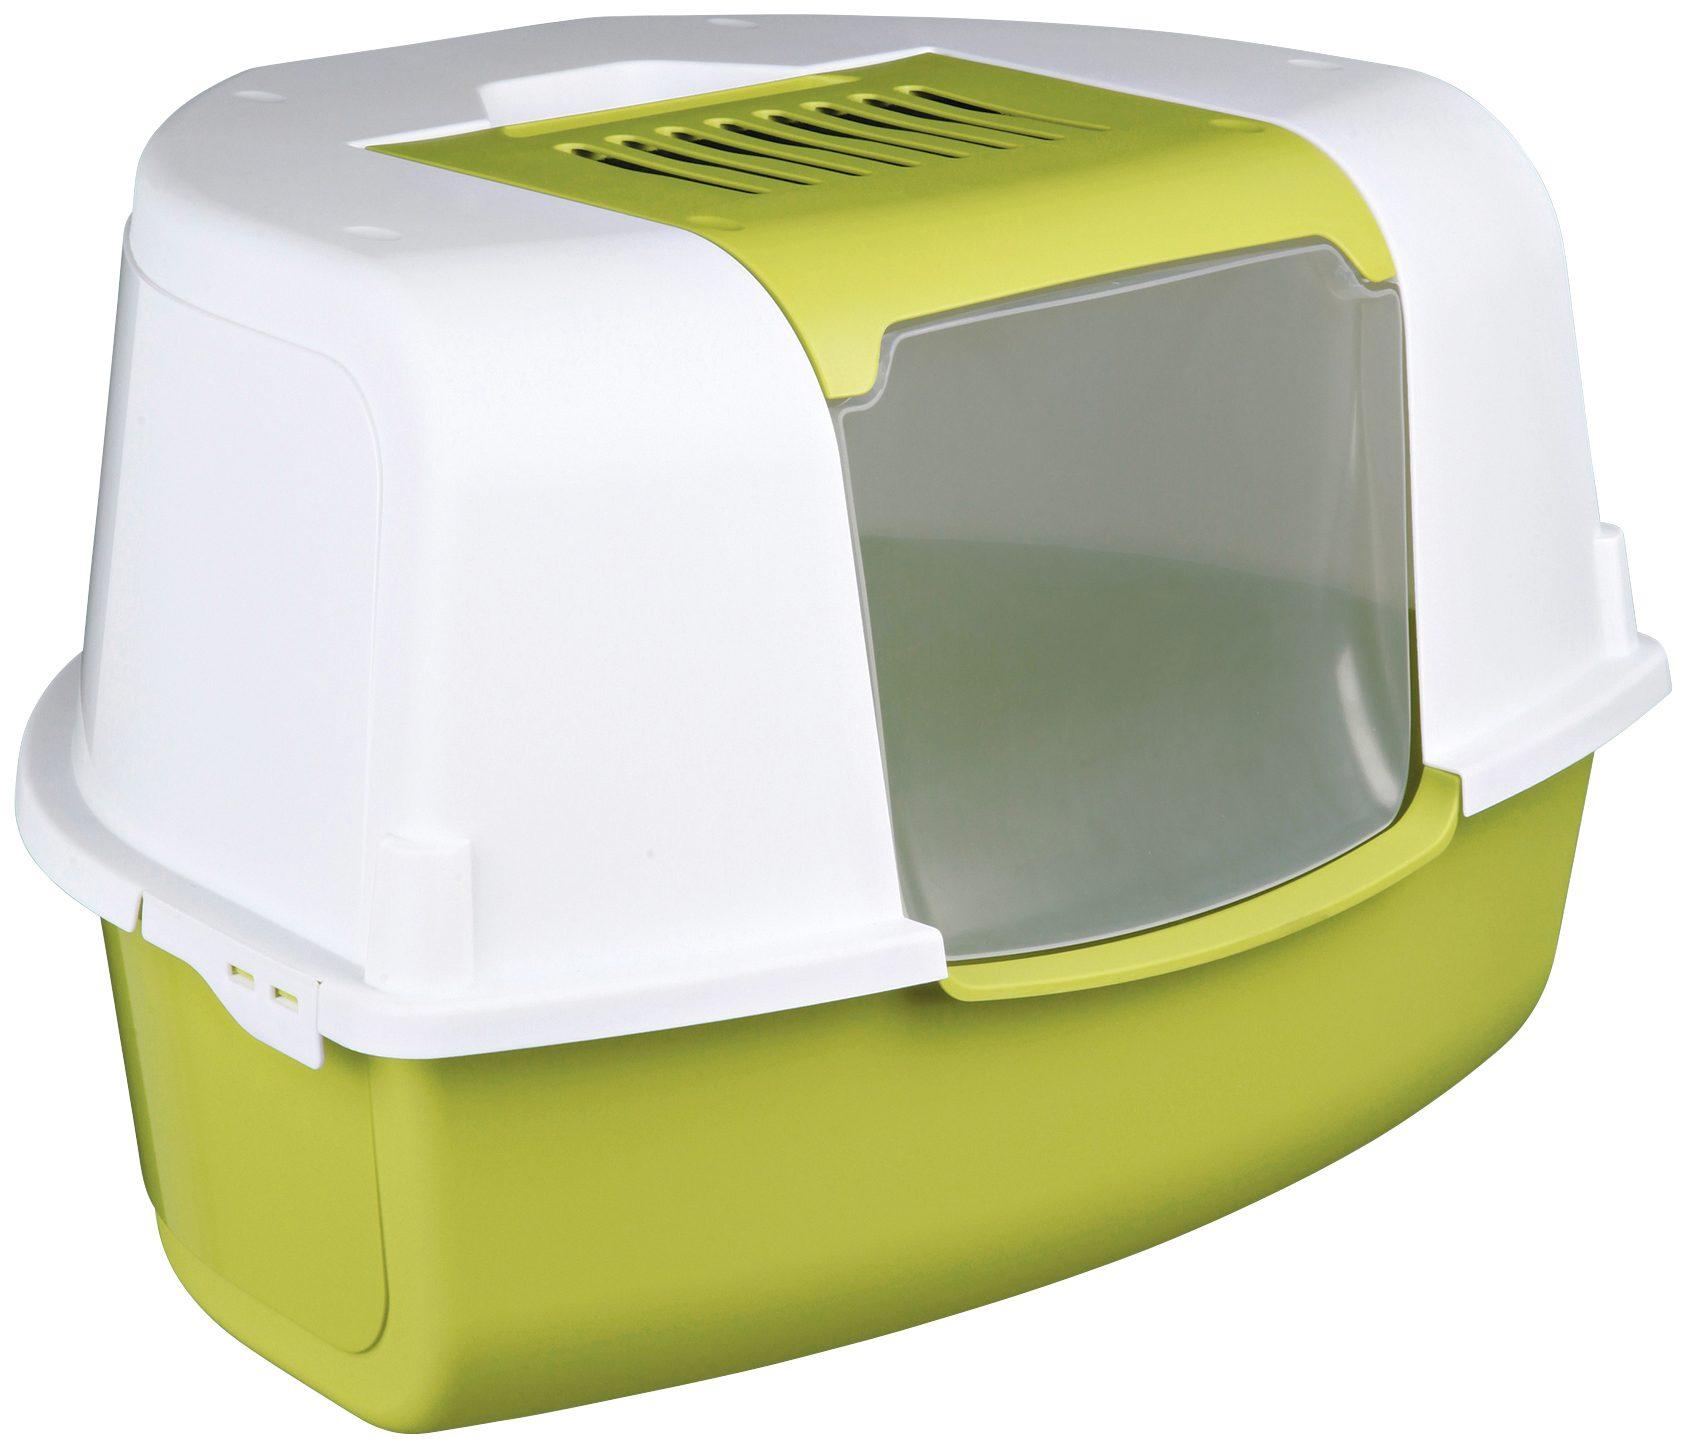 Katzentoilette »Tadeo Open Top«, B/T/H: 58/50/38 cm, hellgrün/weiß